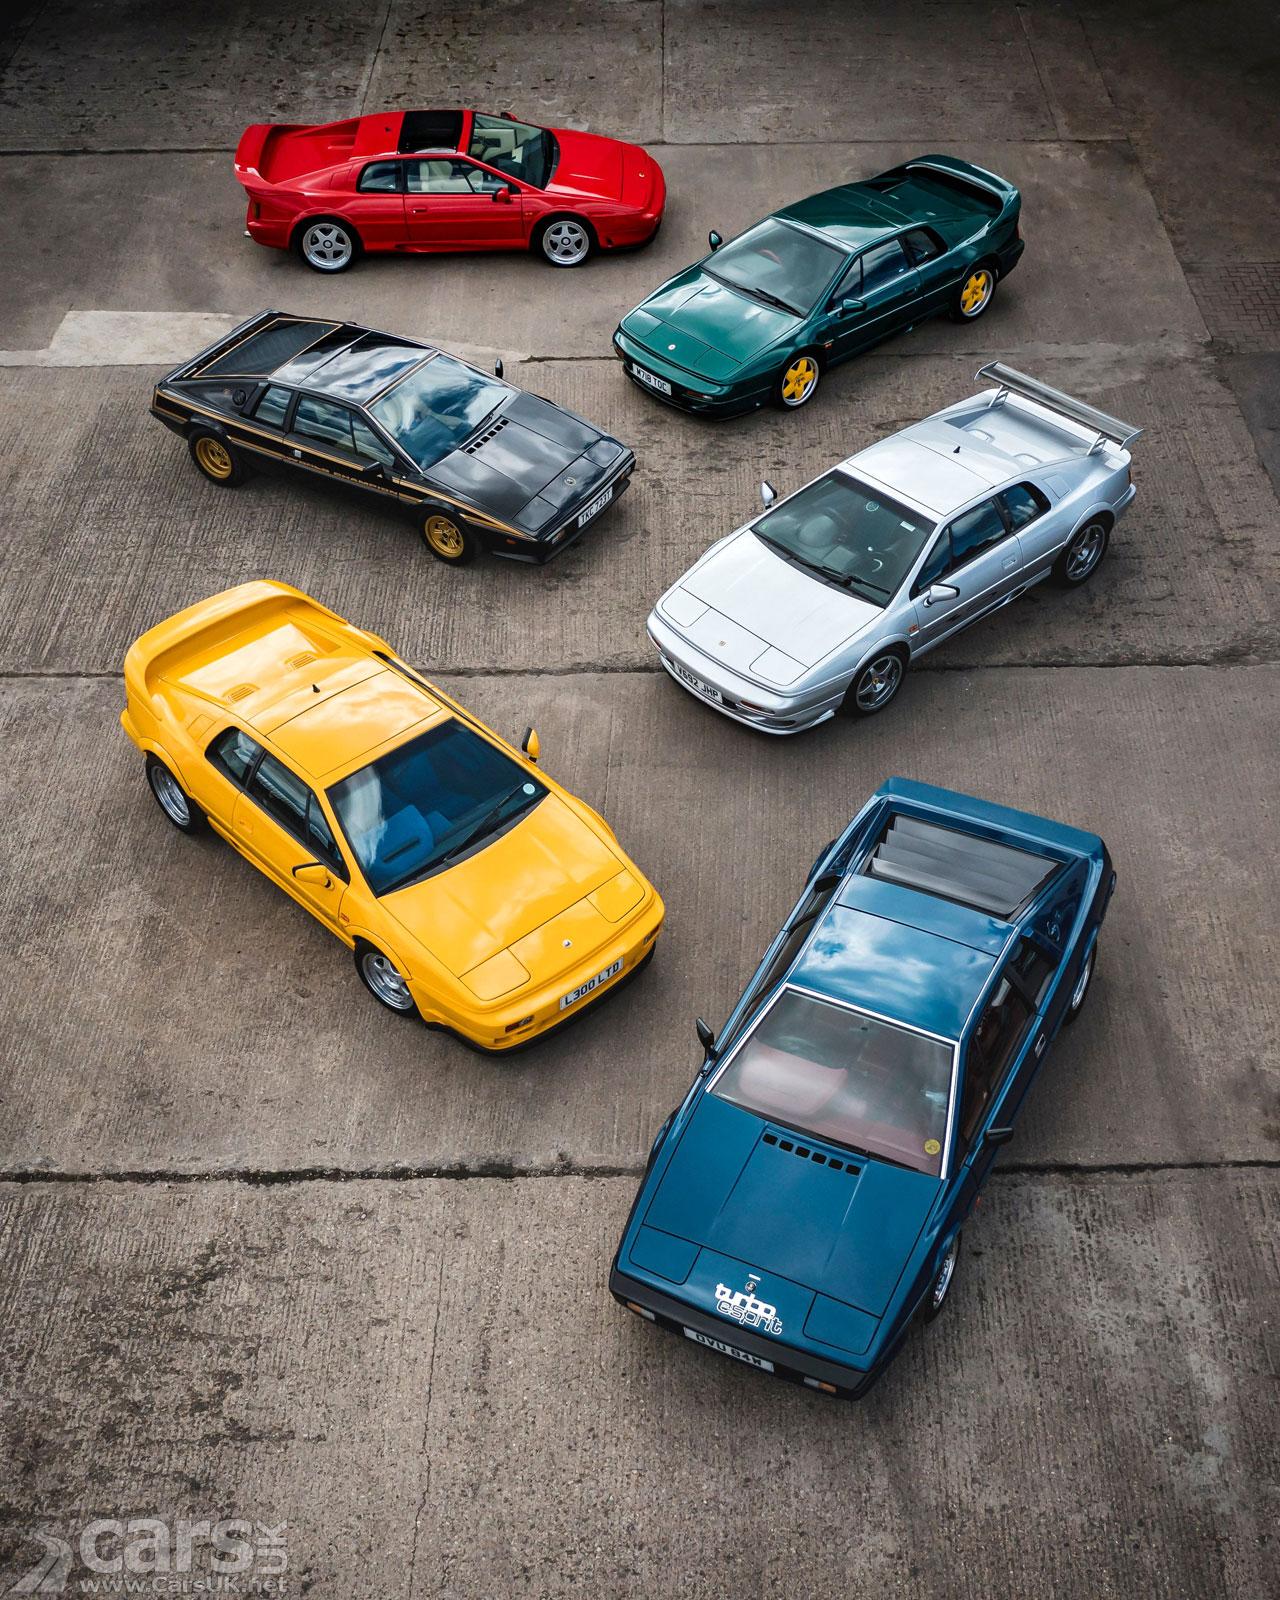 Photo Lotus Esprit Collection 'The Market'